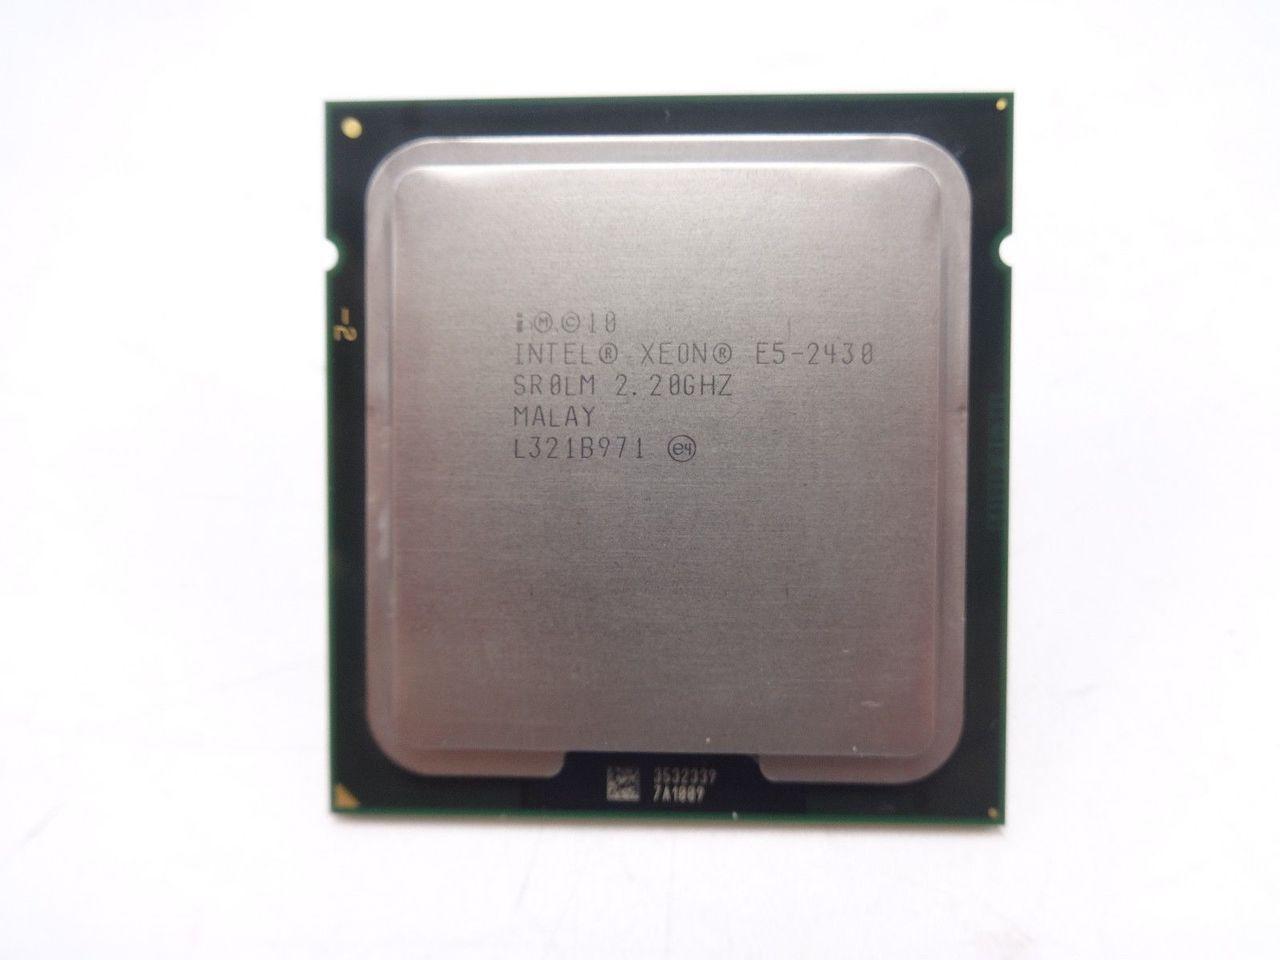 Intel SR0LM E5-2430 6C 2.2GHZ/15MB Processor E5-2430 YWVC1